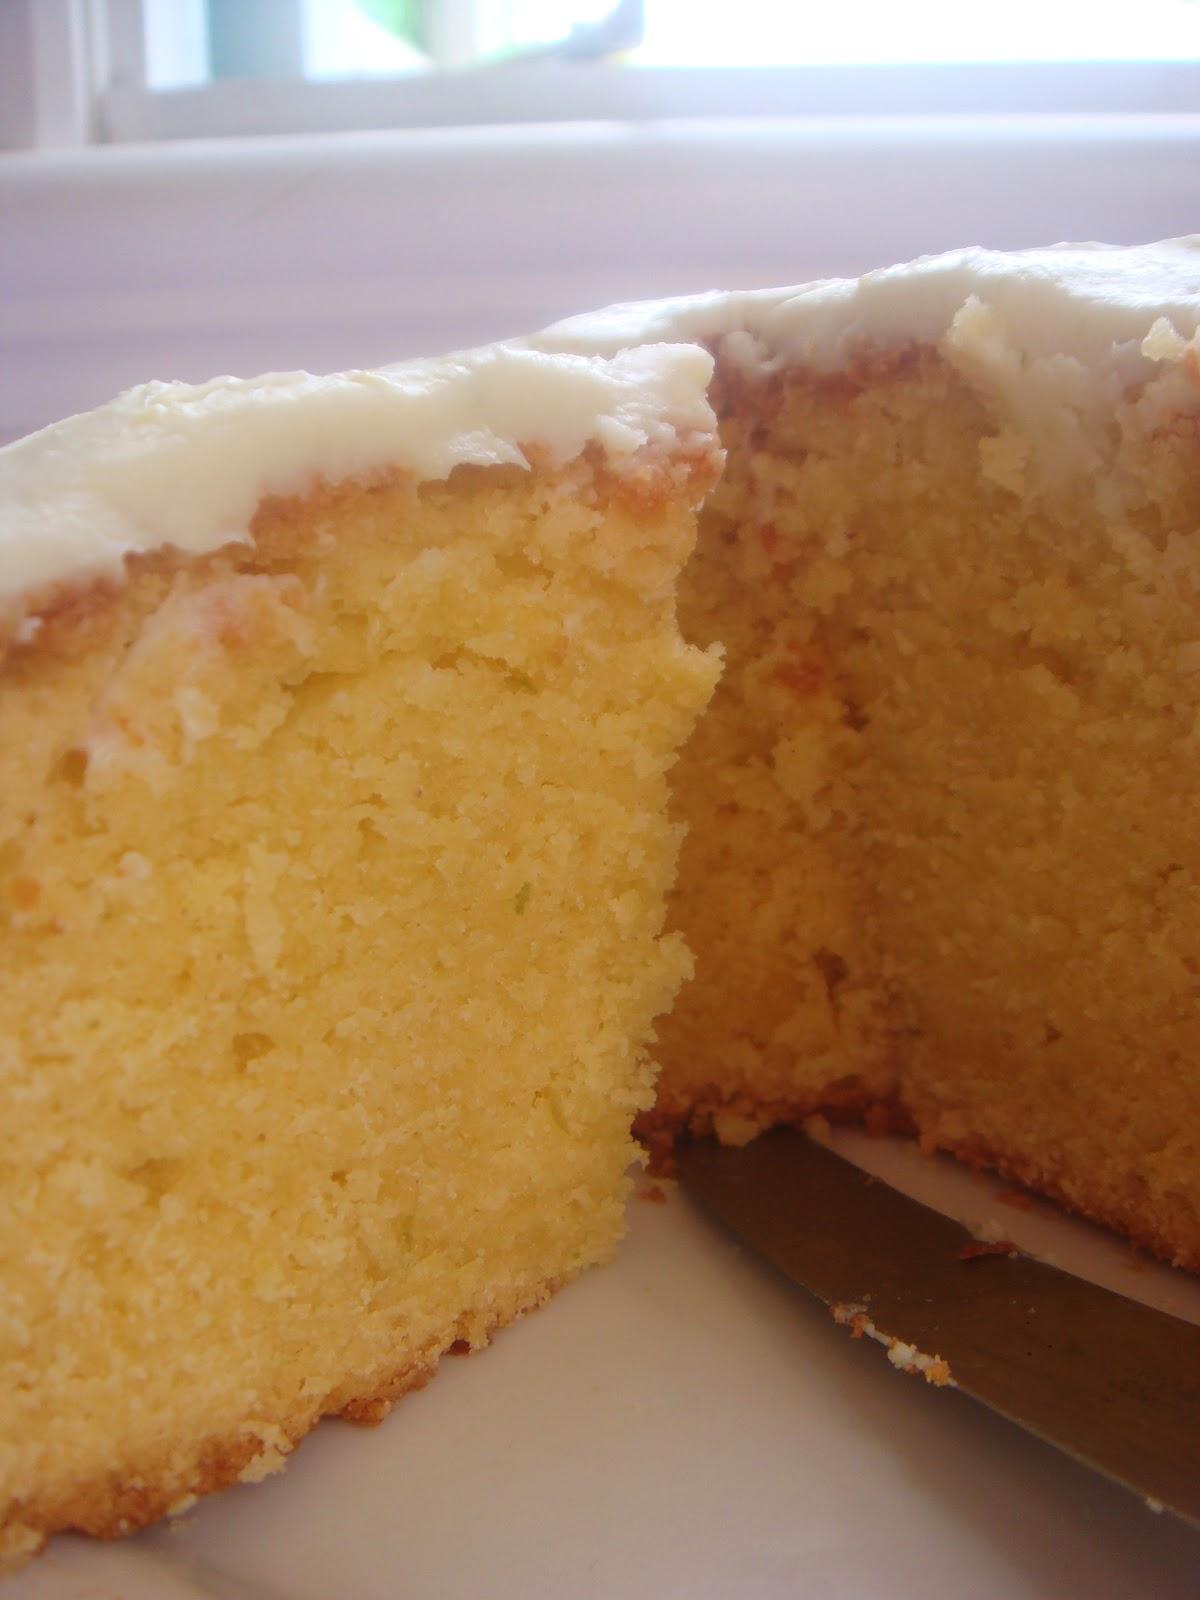 Lemon White Chocolate Mud Cake Recipe